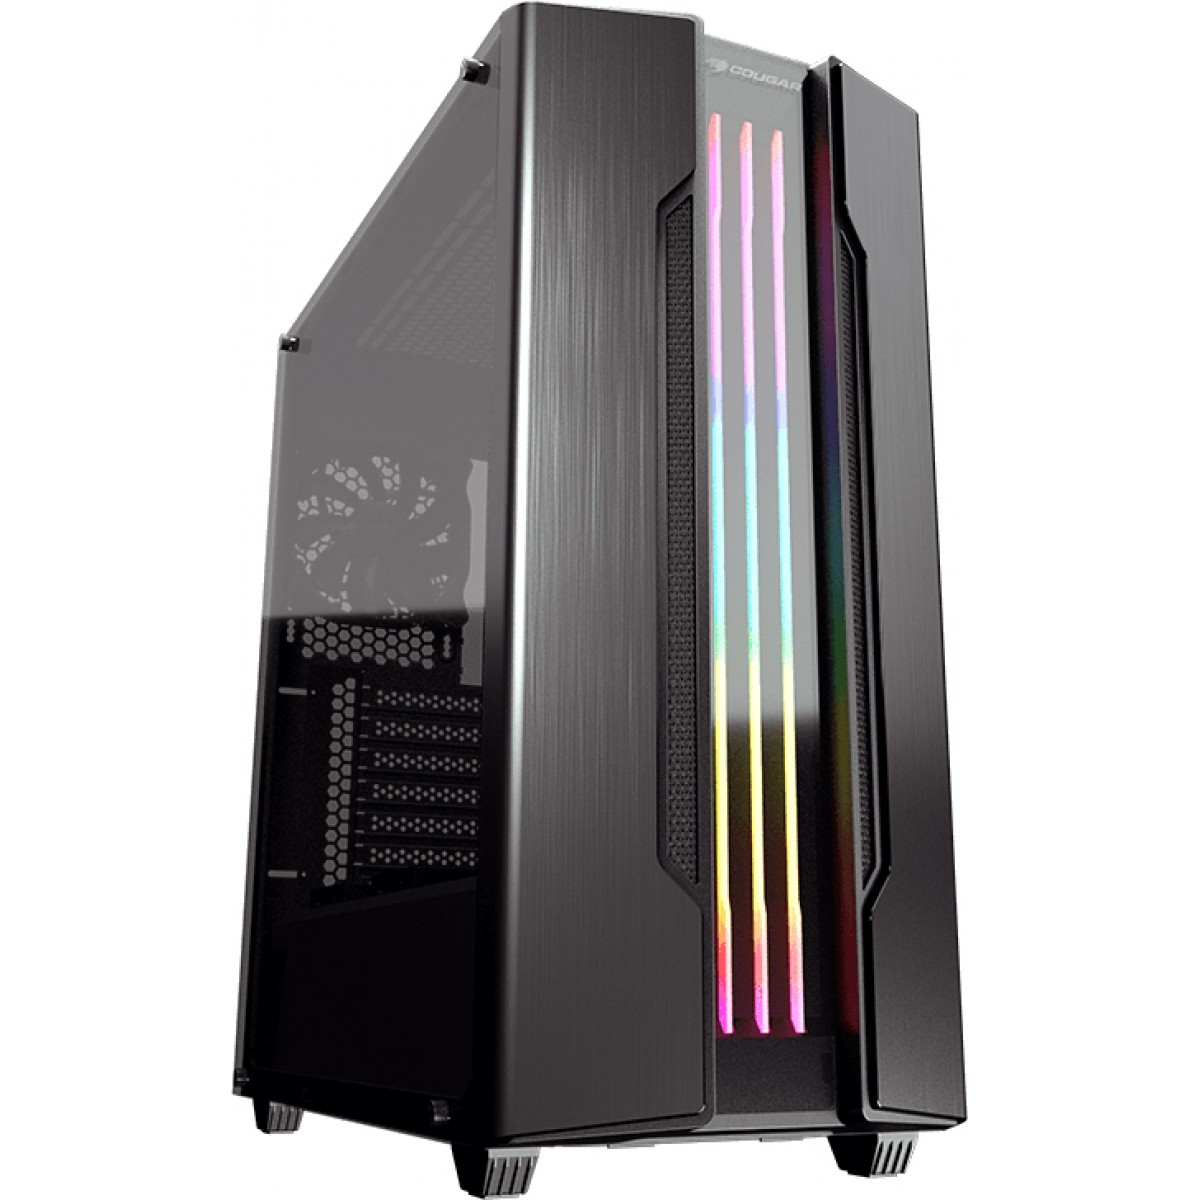 Gabinete Gamer Cougar Gemini S Iron Grey, Mid Tower,Vidro Temperado, Black - 385BMB0-0001